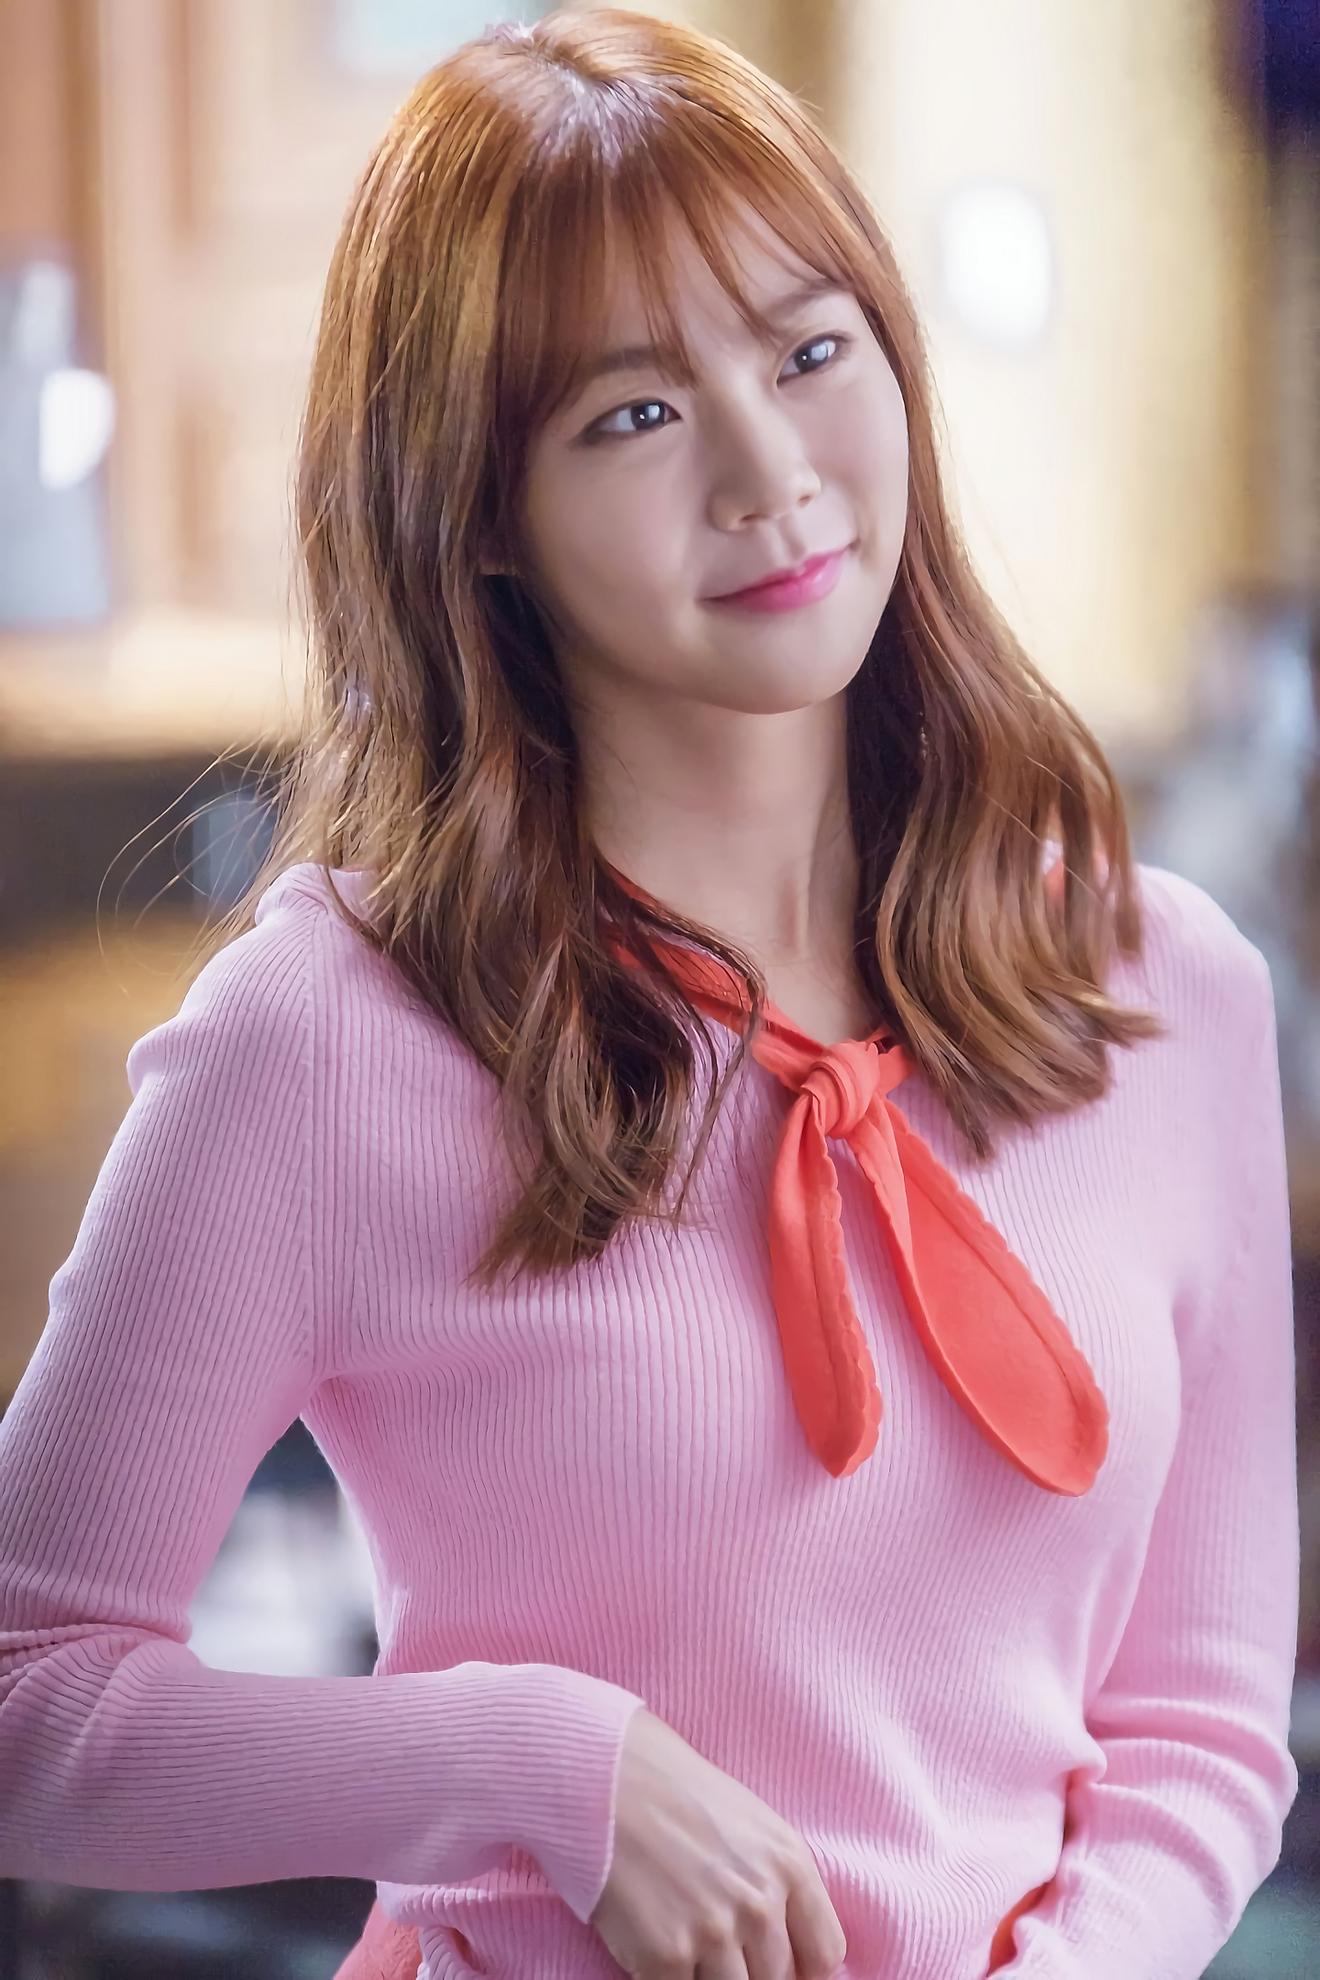 Seungyeon Han Android Iphone Wallpaper Asiachan Kpop Jpop Image Board